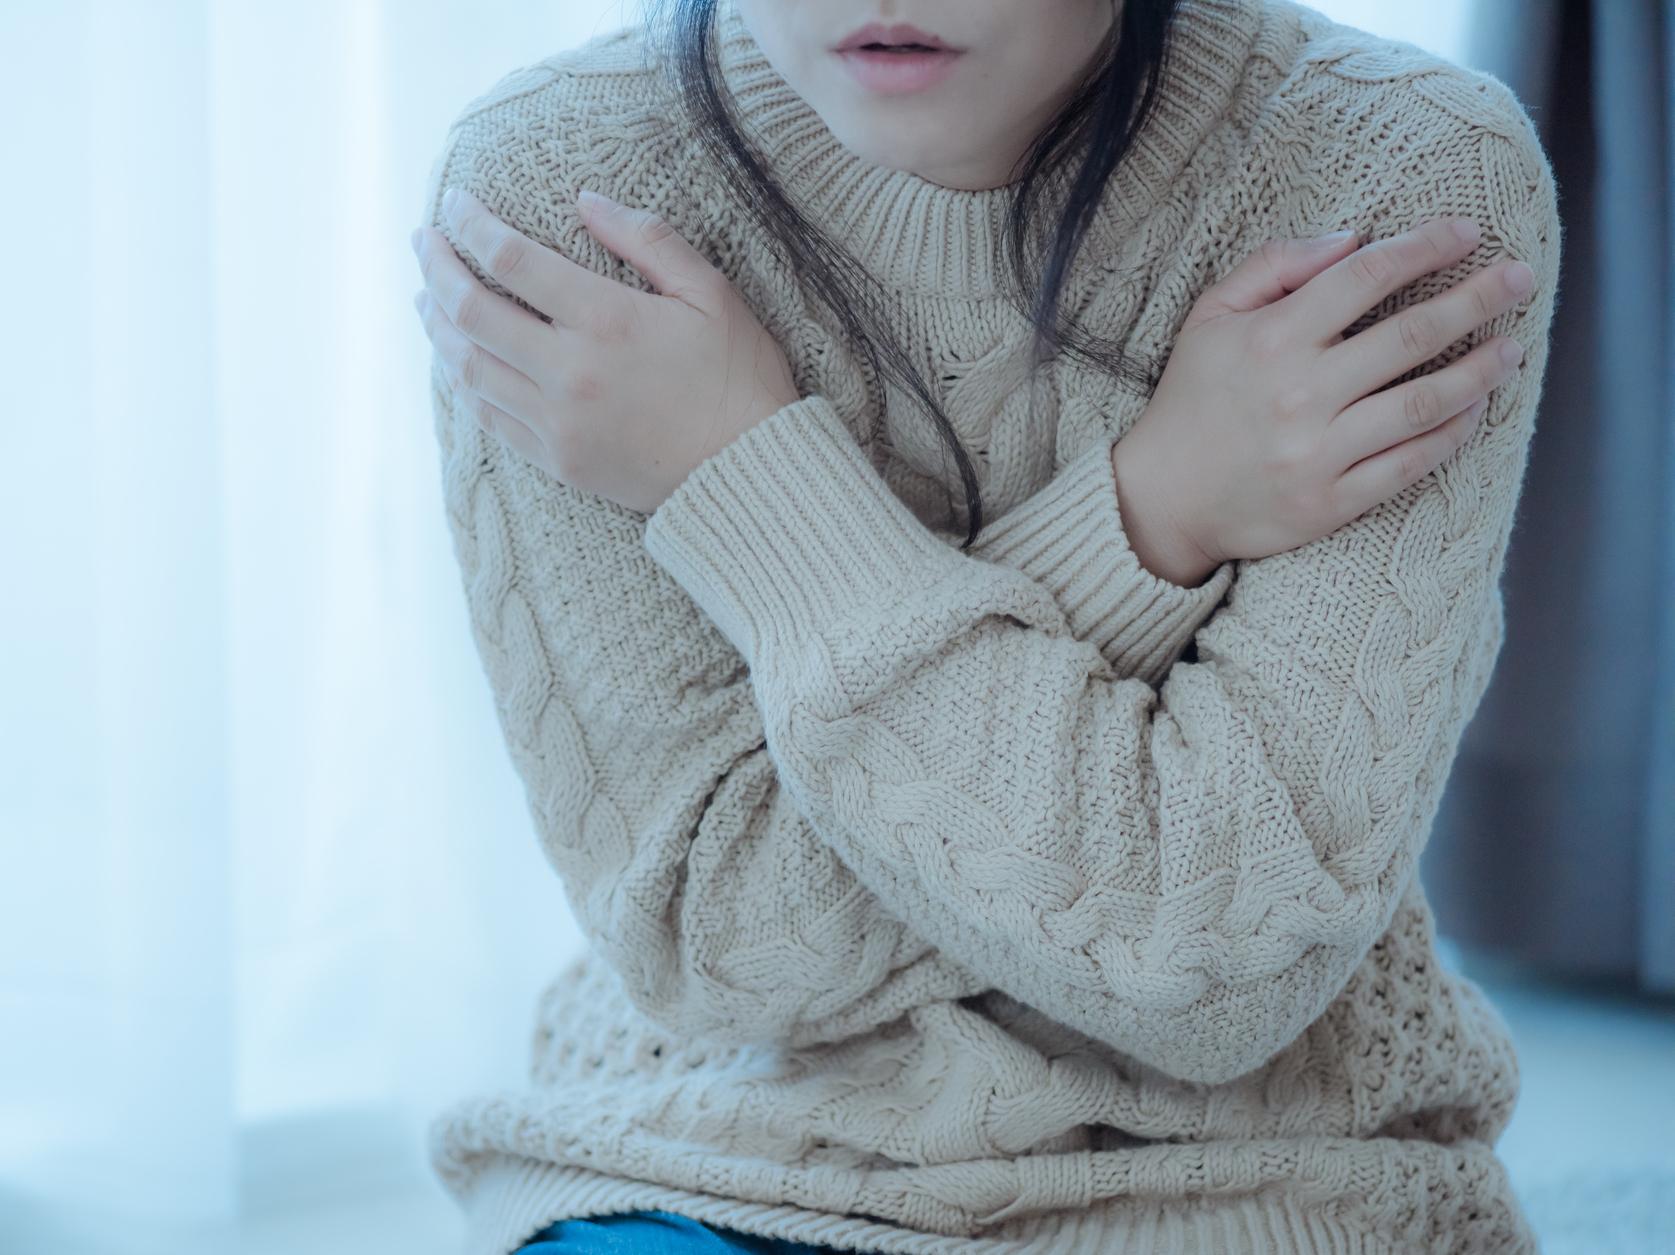 寒い 妊娠 超 初期